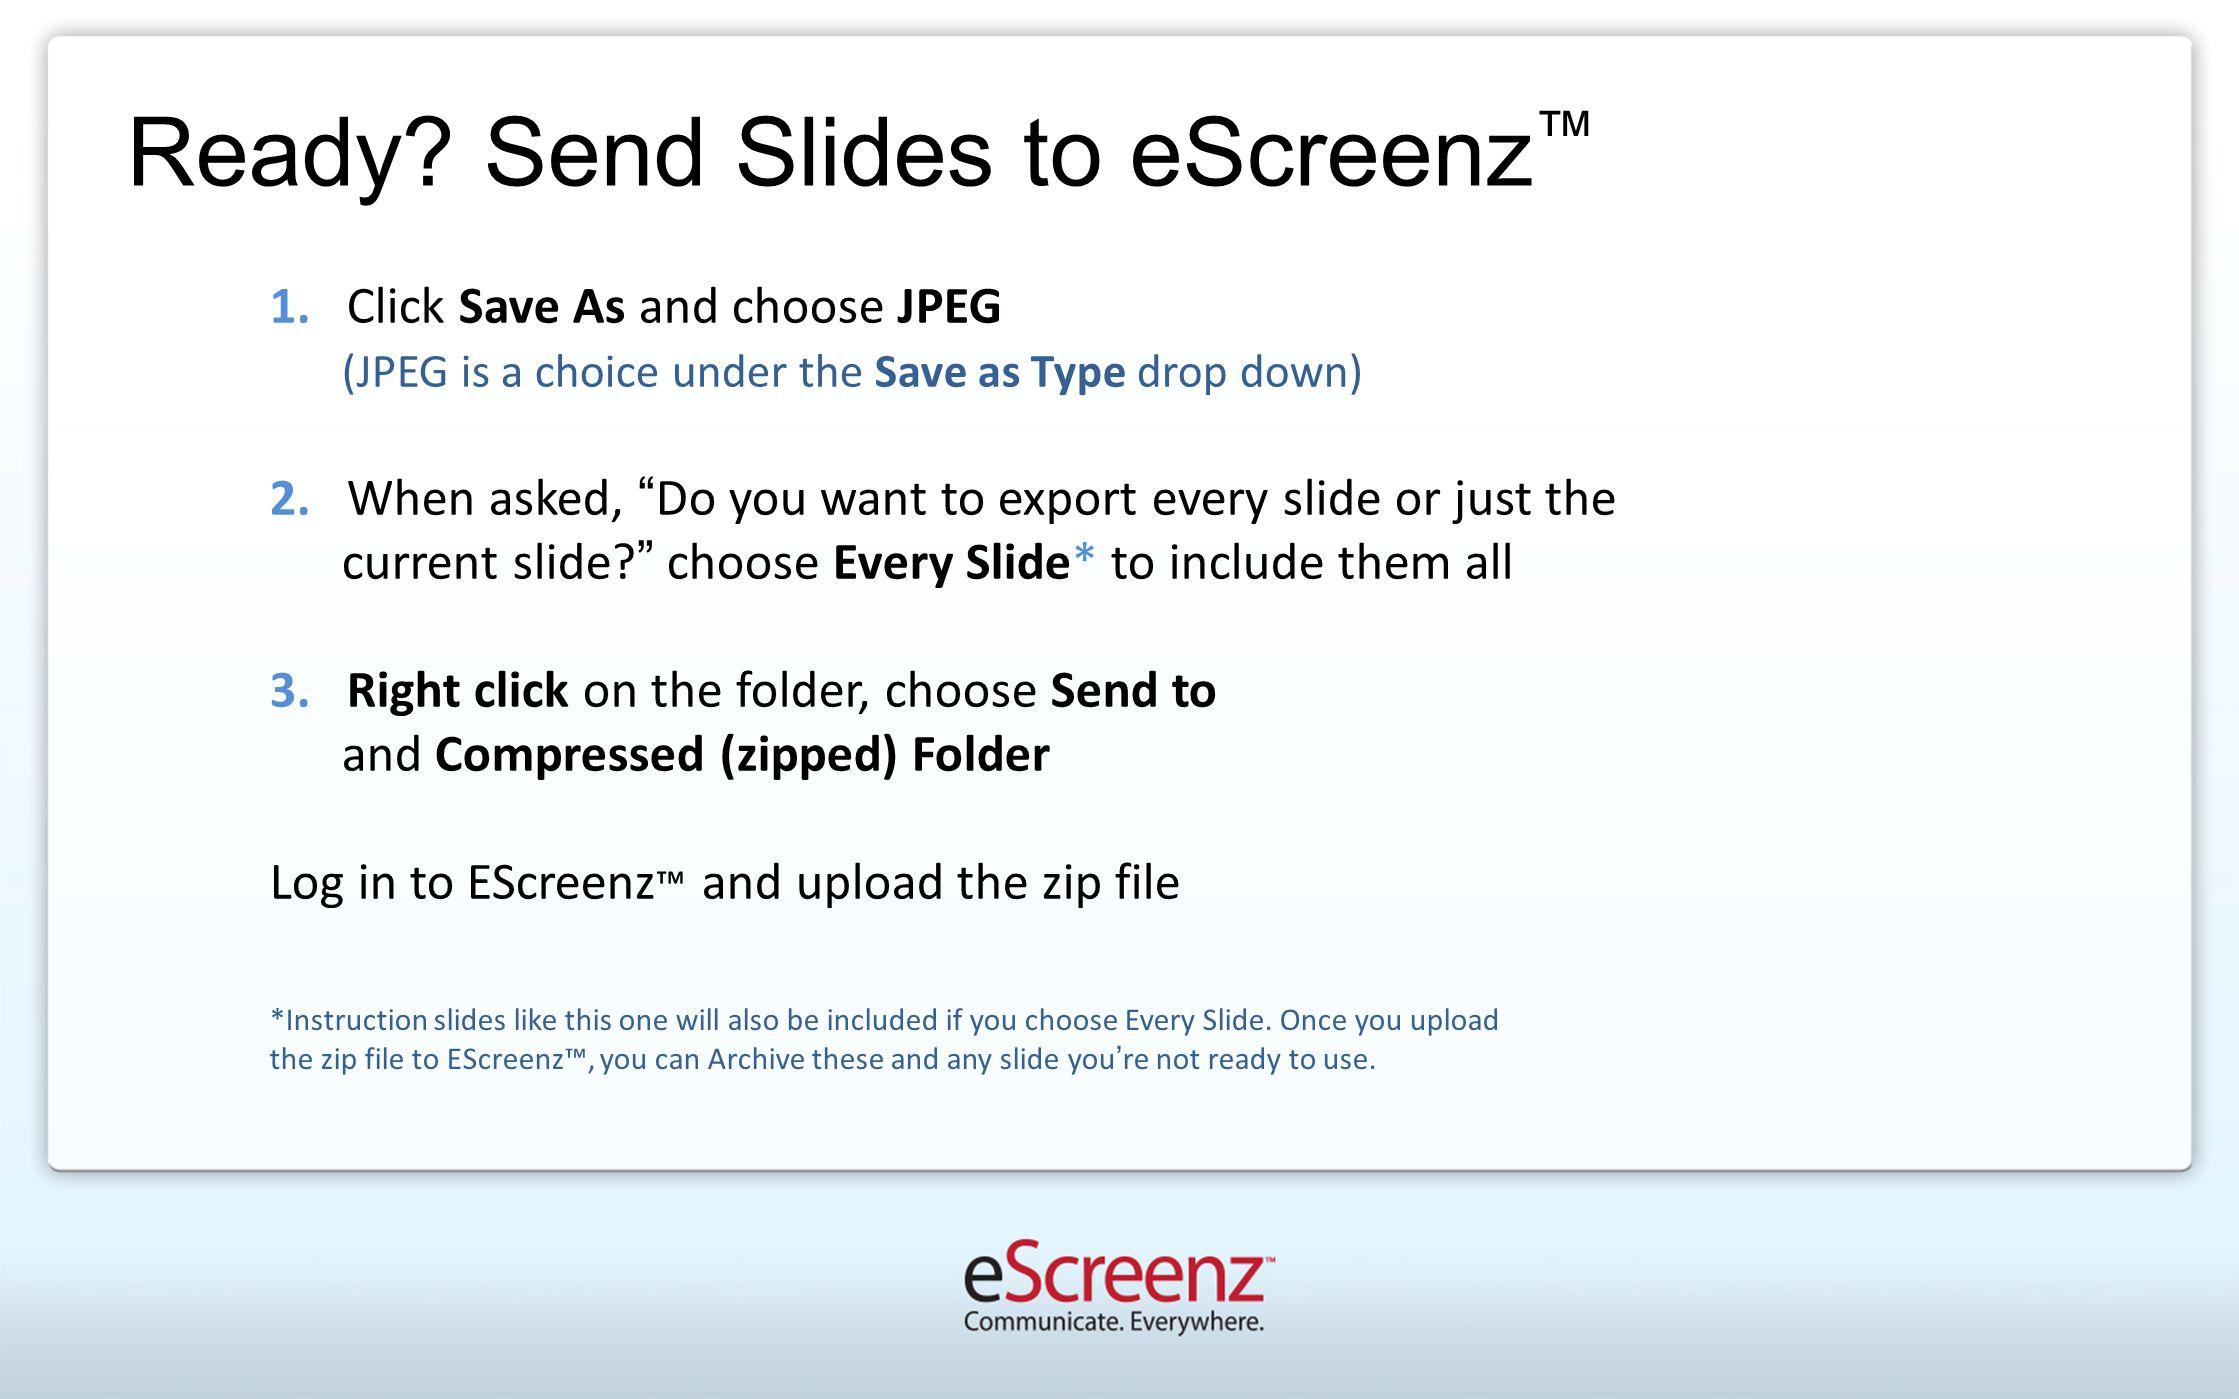 Ready. Send Slides to eScreenz ™ 1.